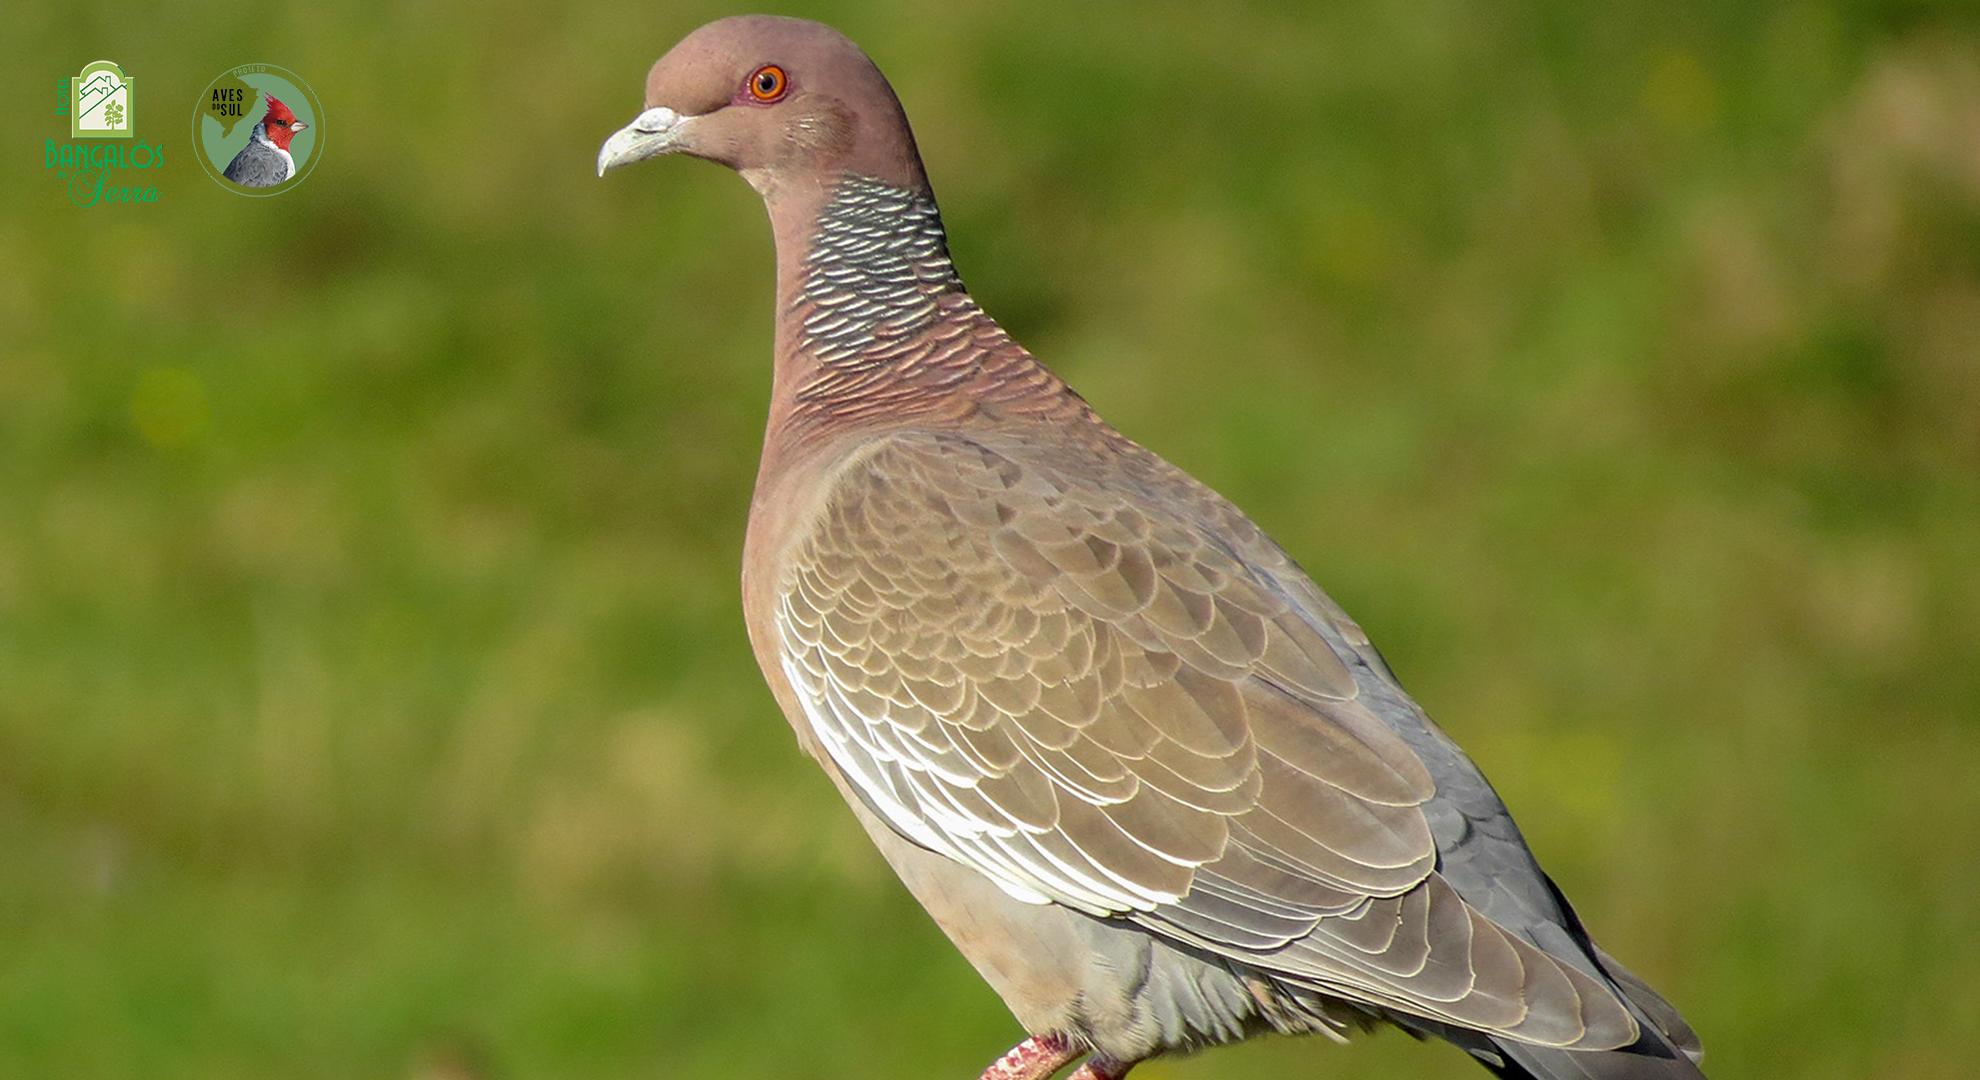 Birdwatching em Gramado com Raphael Kurz